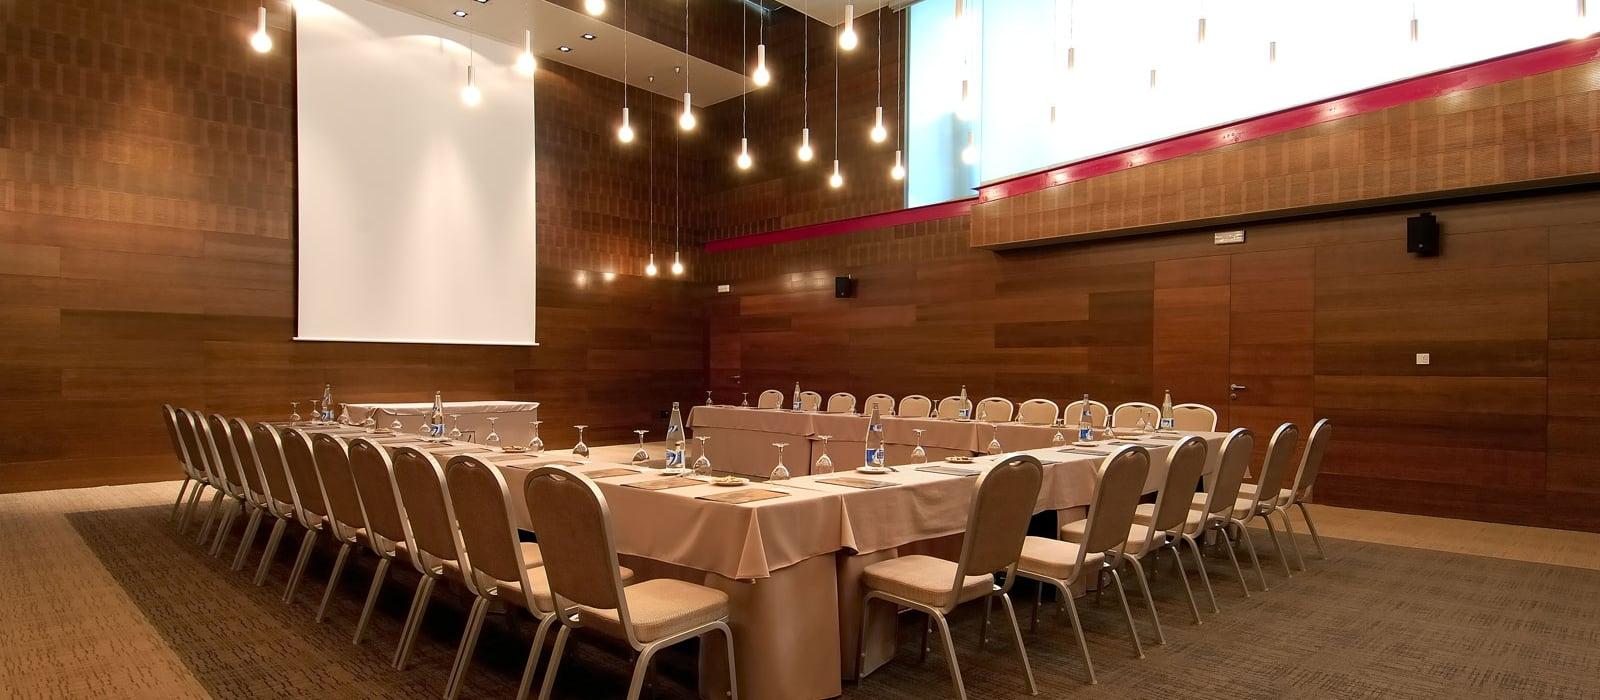 Servizi Soho Hotel Madrid - Vincci Hoteles - Saloni